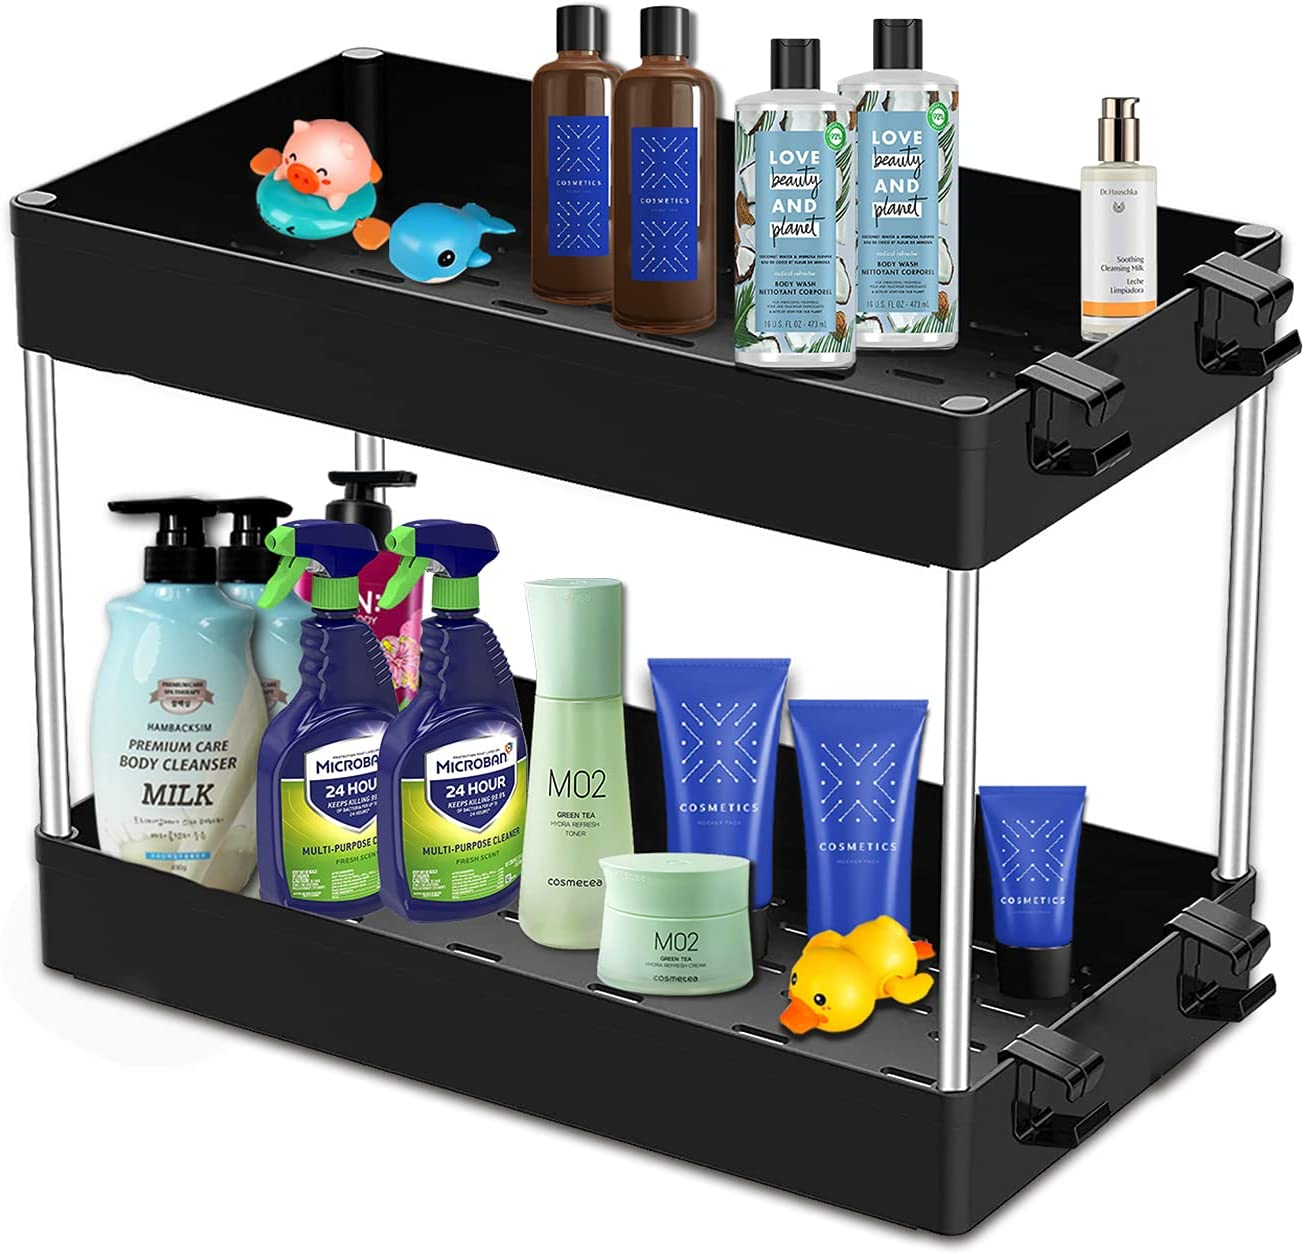 Max 90% 70% OFF Outlet OFF Cleaner Organizer Under Sink Bathroom Stora